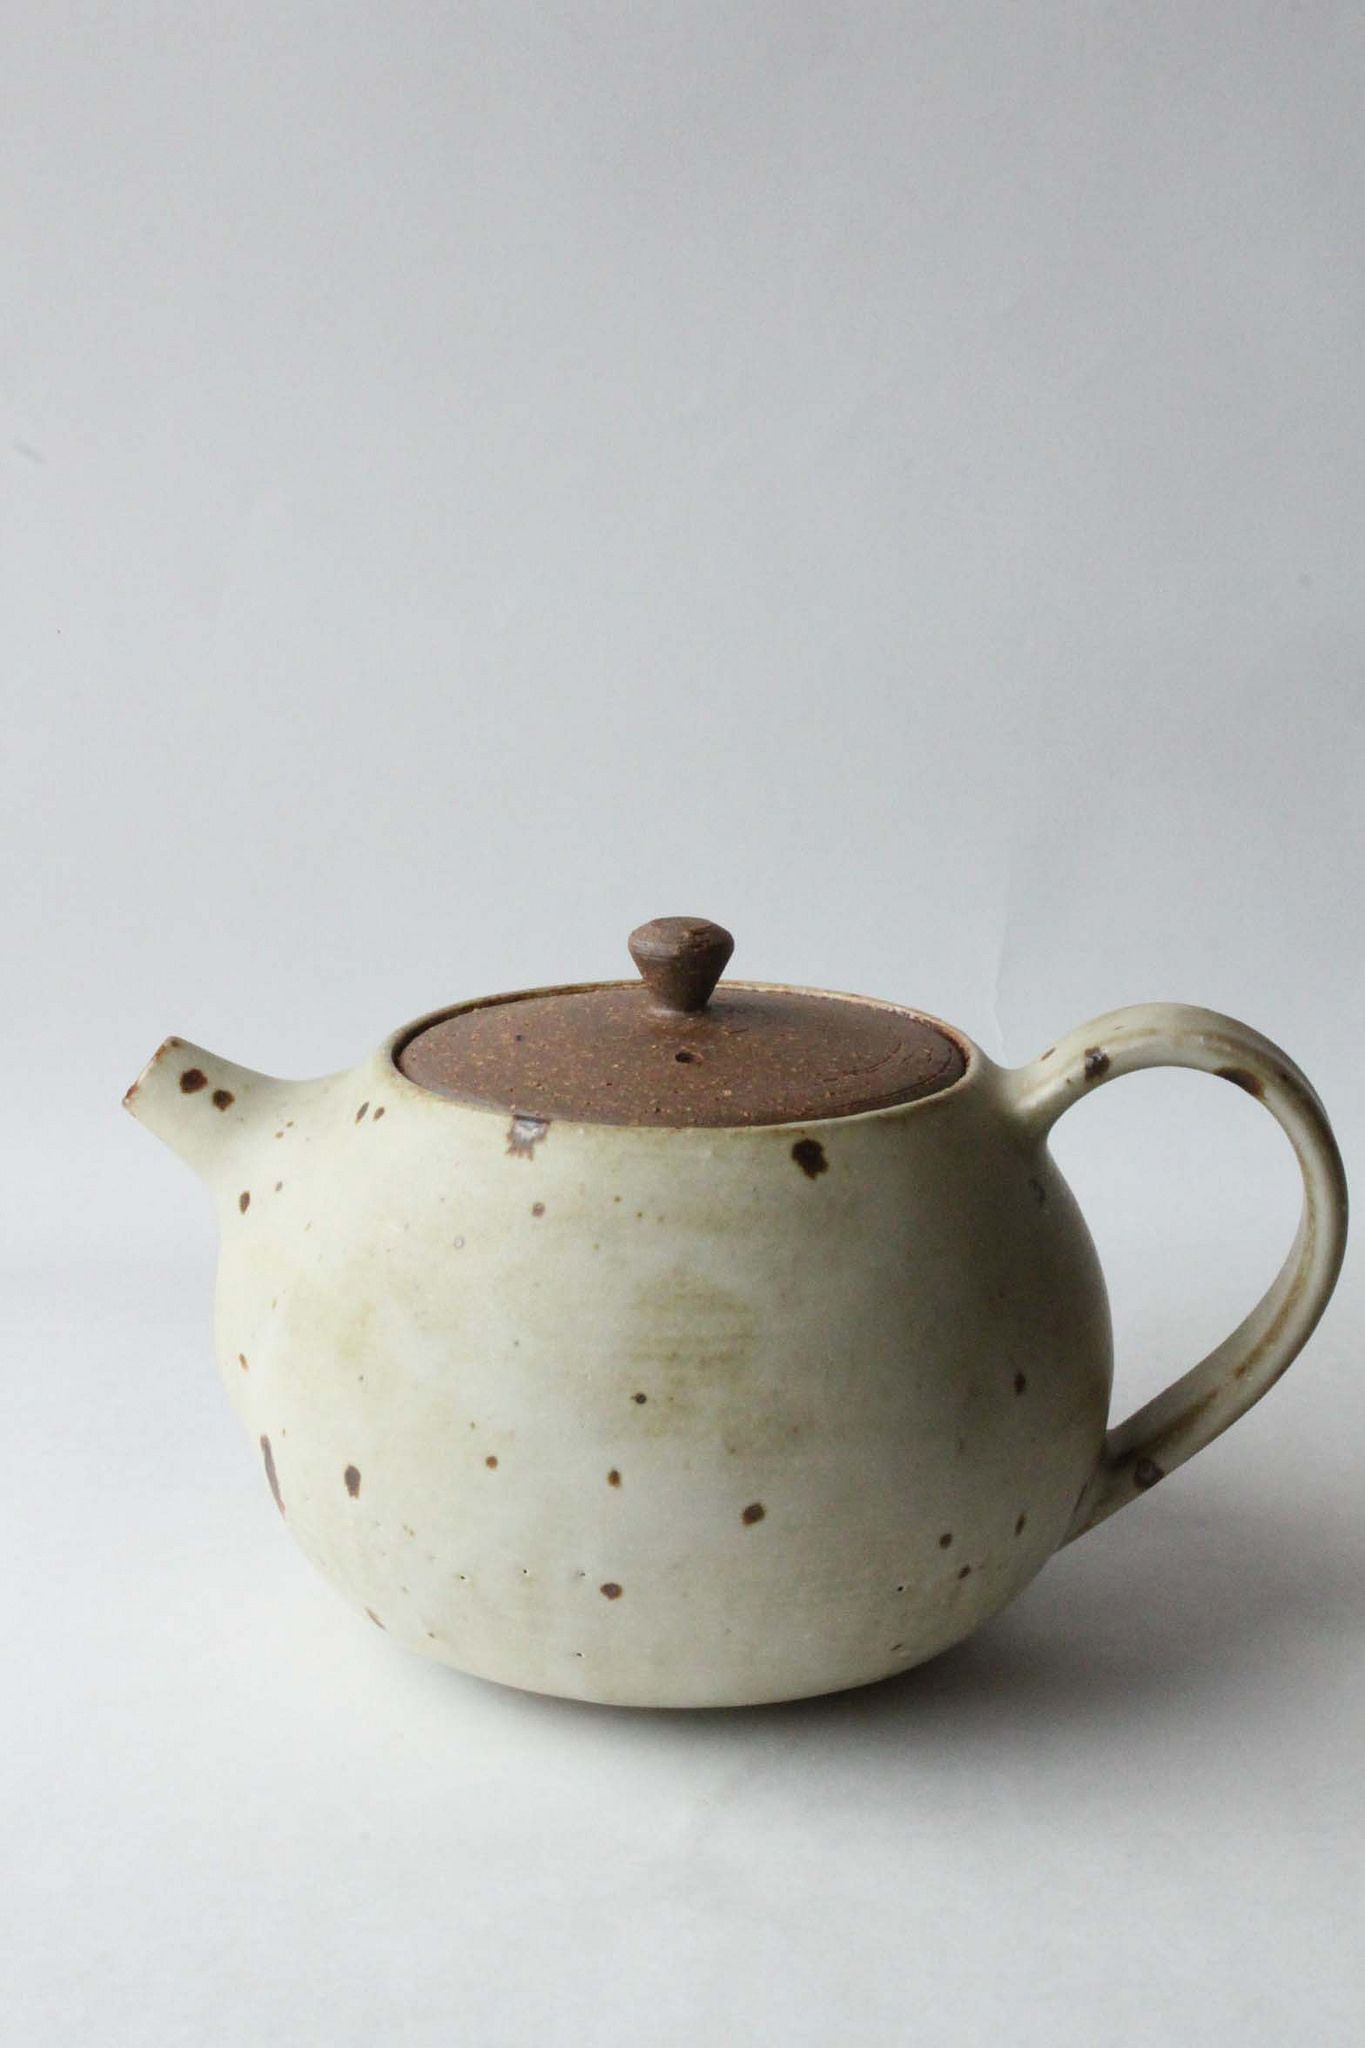 teapot #teapots teapot | anewdawnanewday | Flickr #ceramicteapots